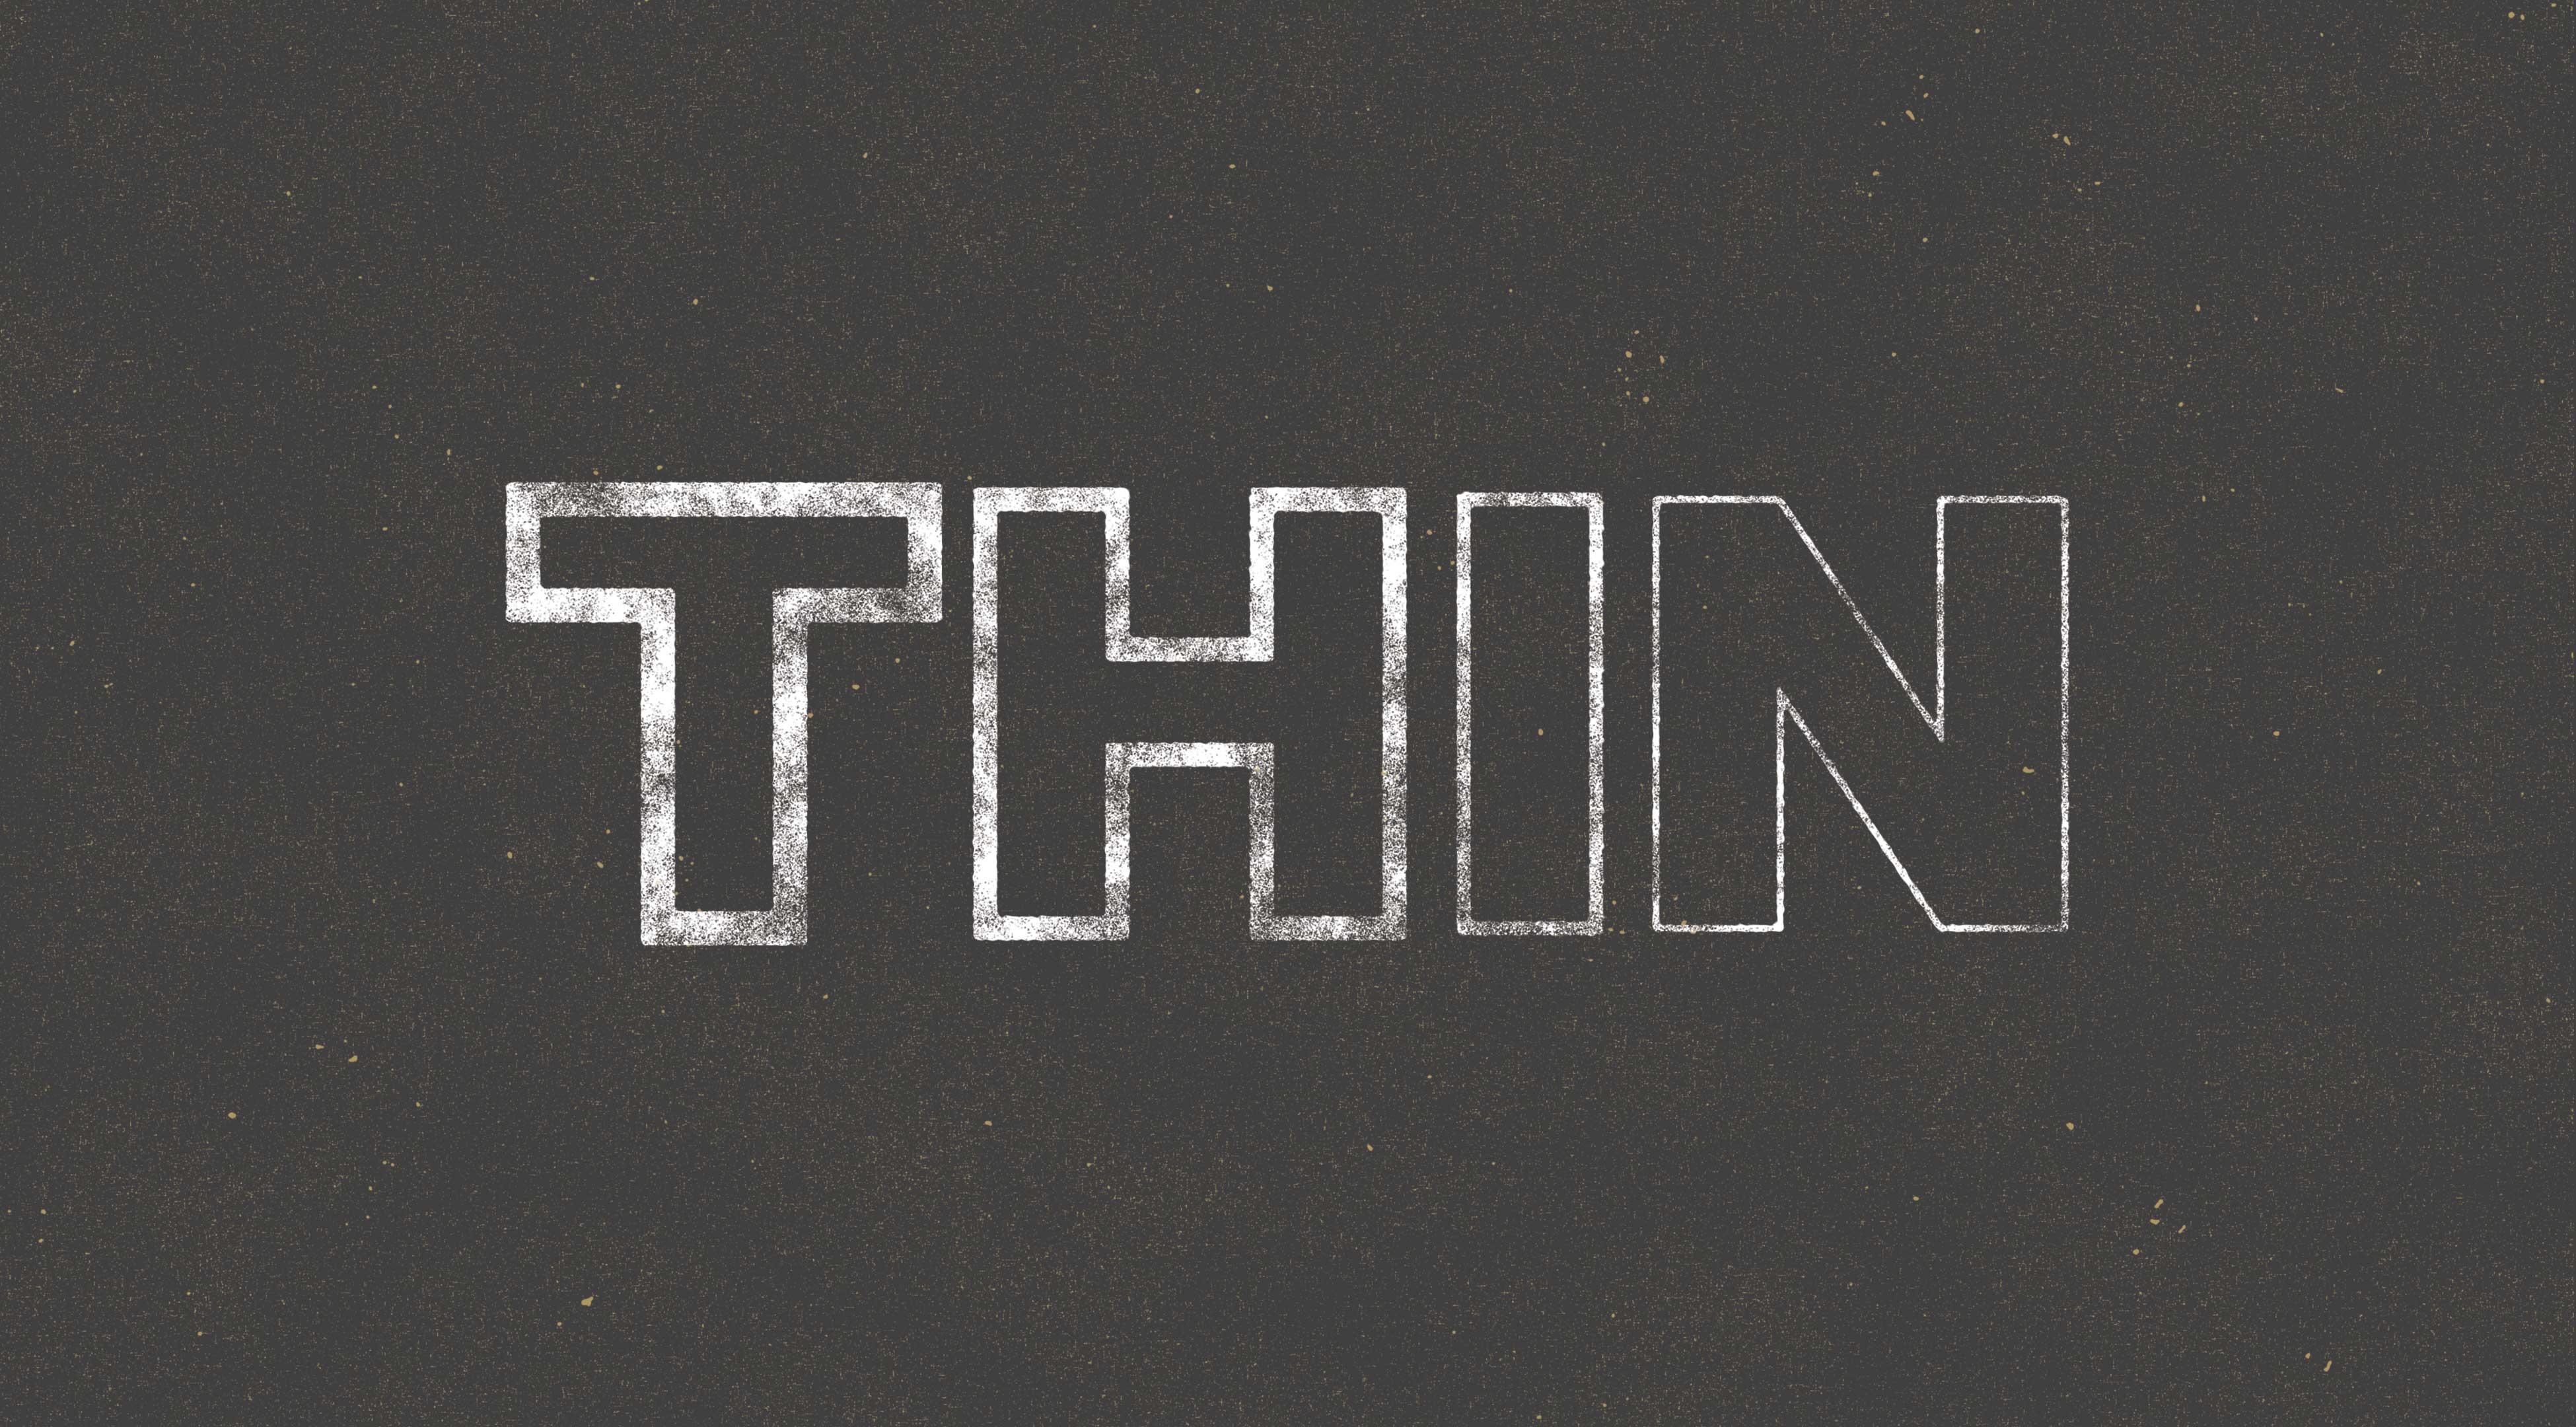 Thin_powerpoint_announcement